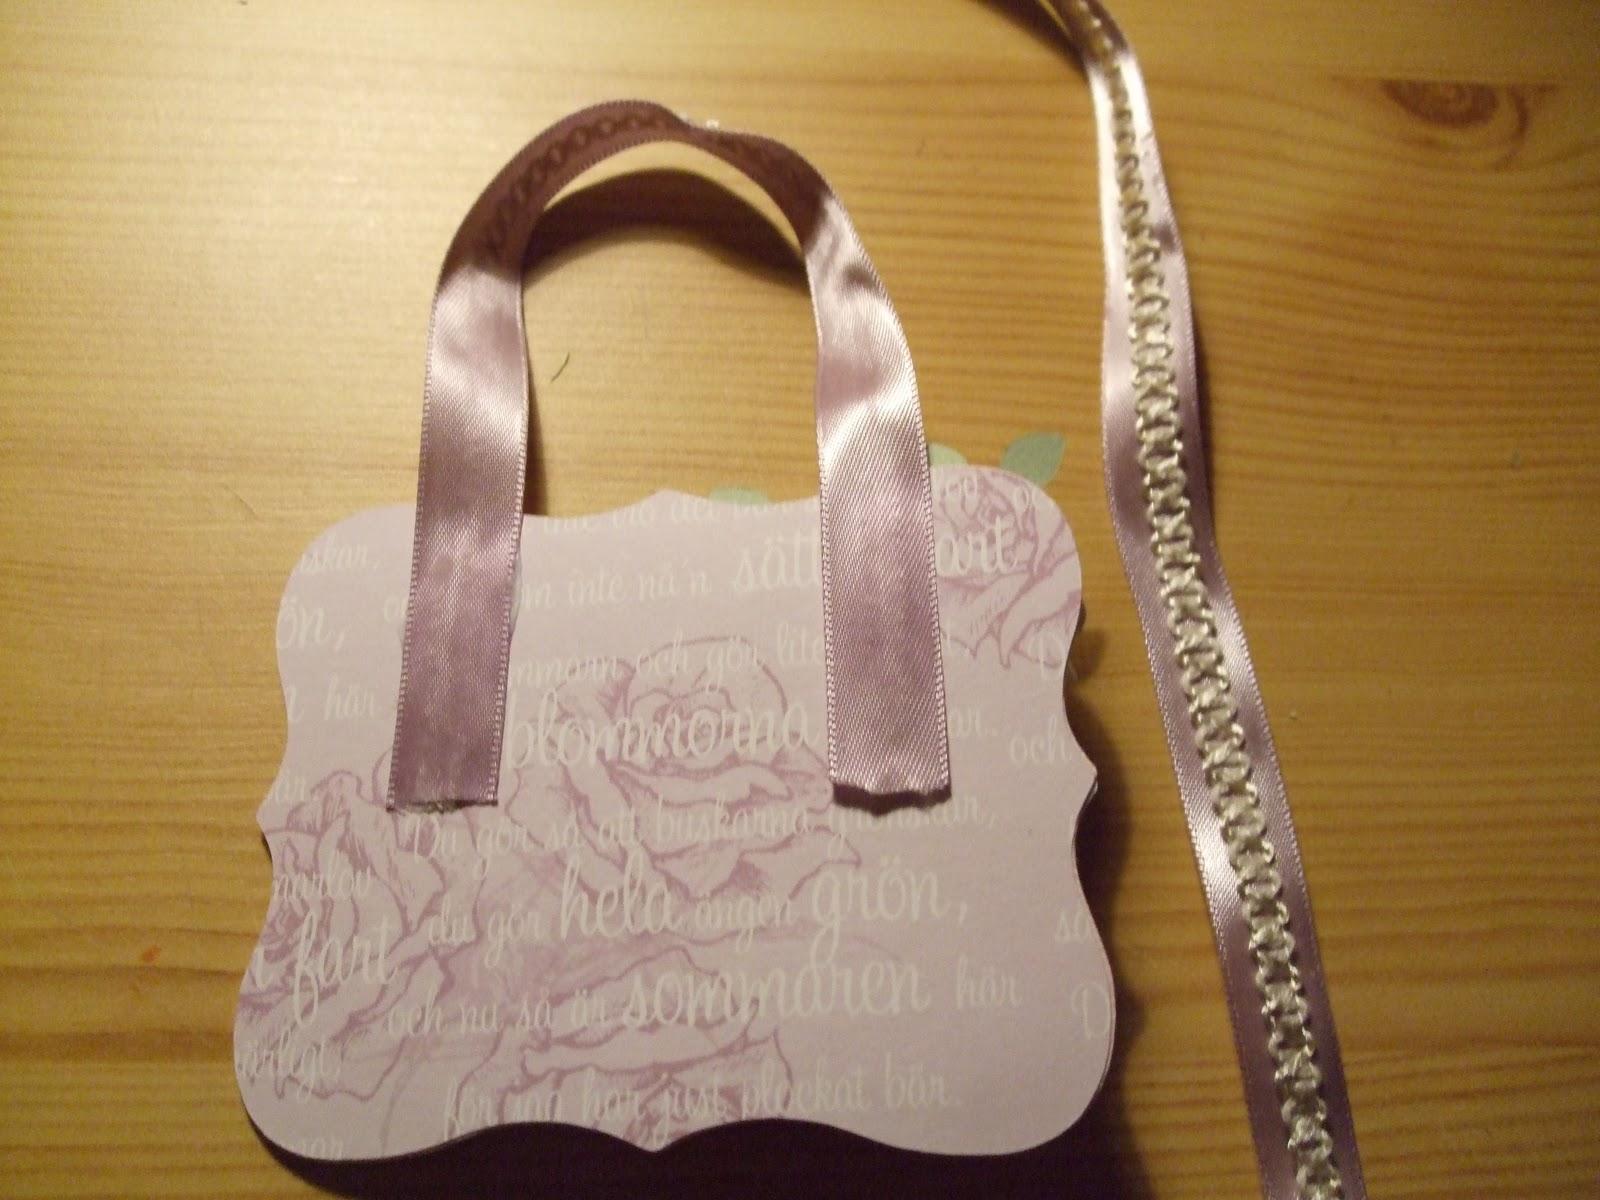 How-to-DIY-Handbag-Style-Paper-Gift-Basket-9.jpg